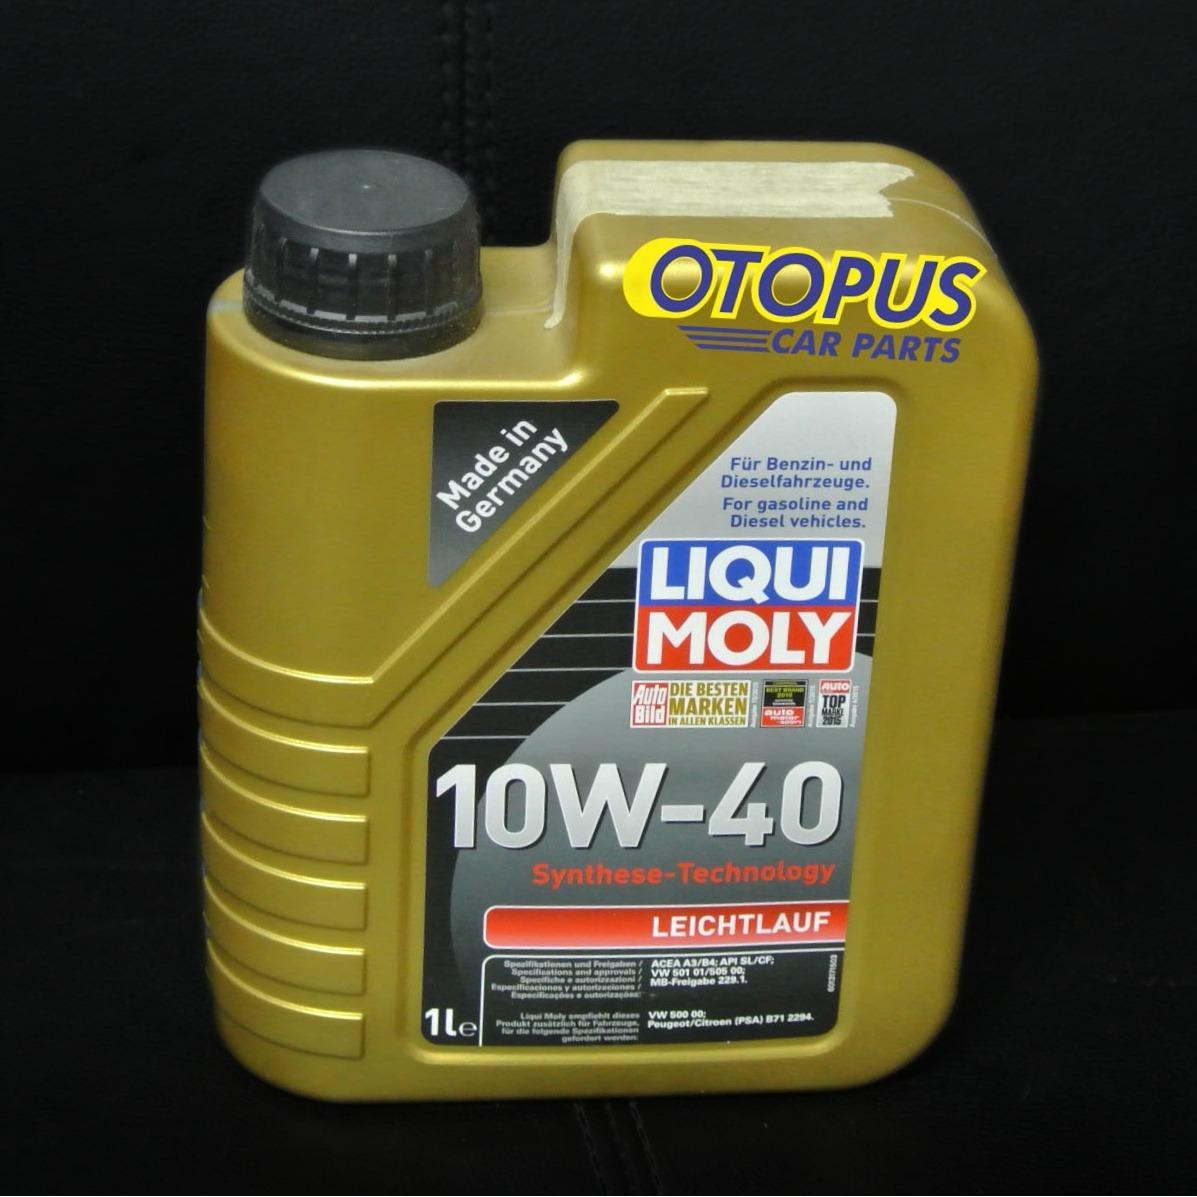 Kehebatan Shell Helix Hx 5 1 Liter 15w 40 Oli Mesin Mobil Bensin Dan Hx5 Api Sn 4 Liqui Moly Leichtlauf 10w